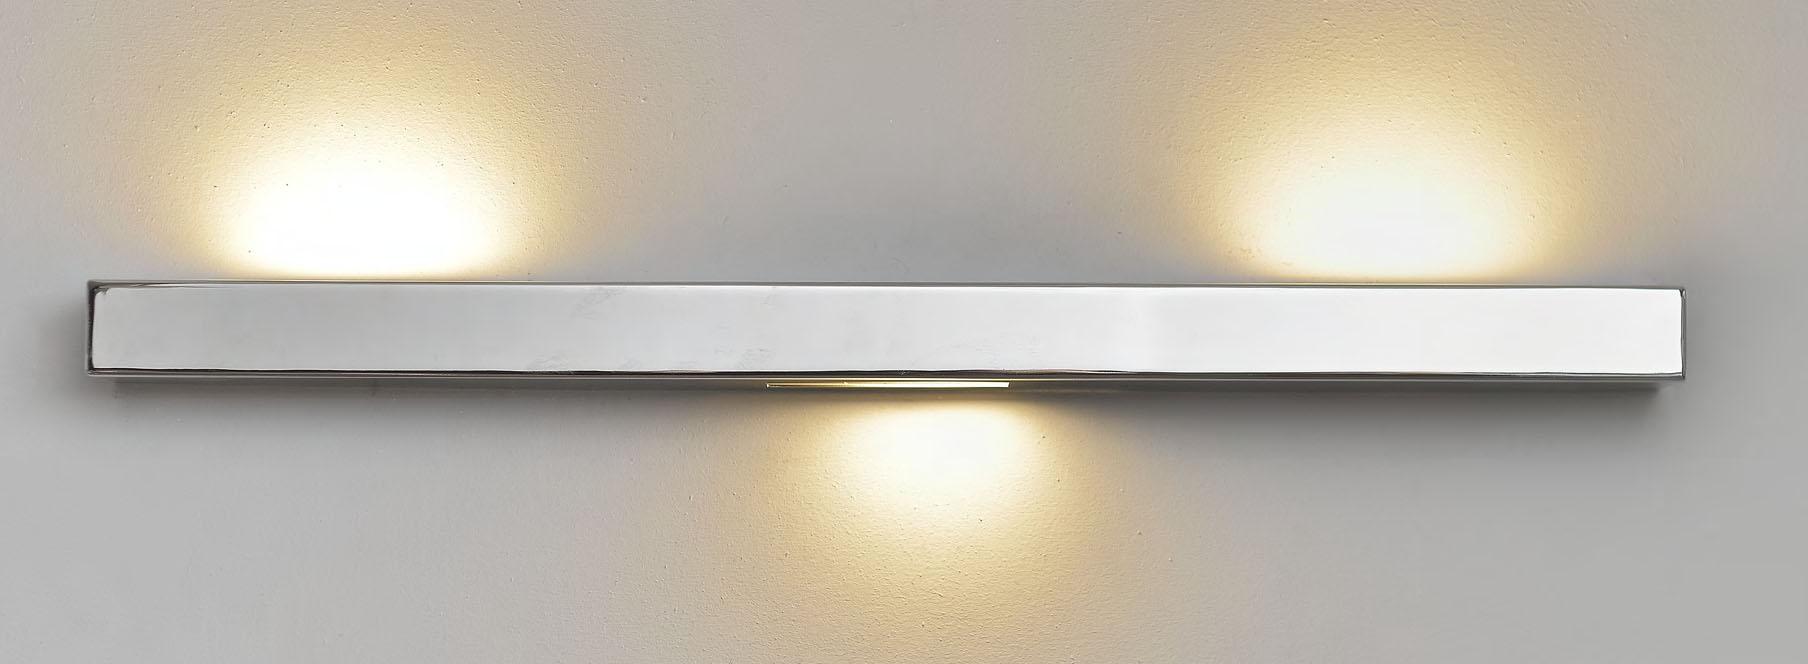 Sideform lampada da parete tratto led   notali lampadari